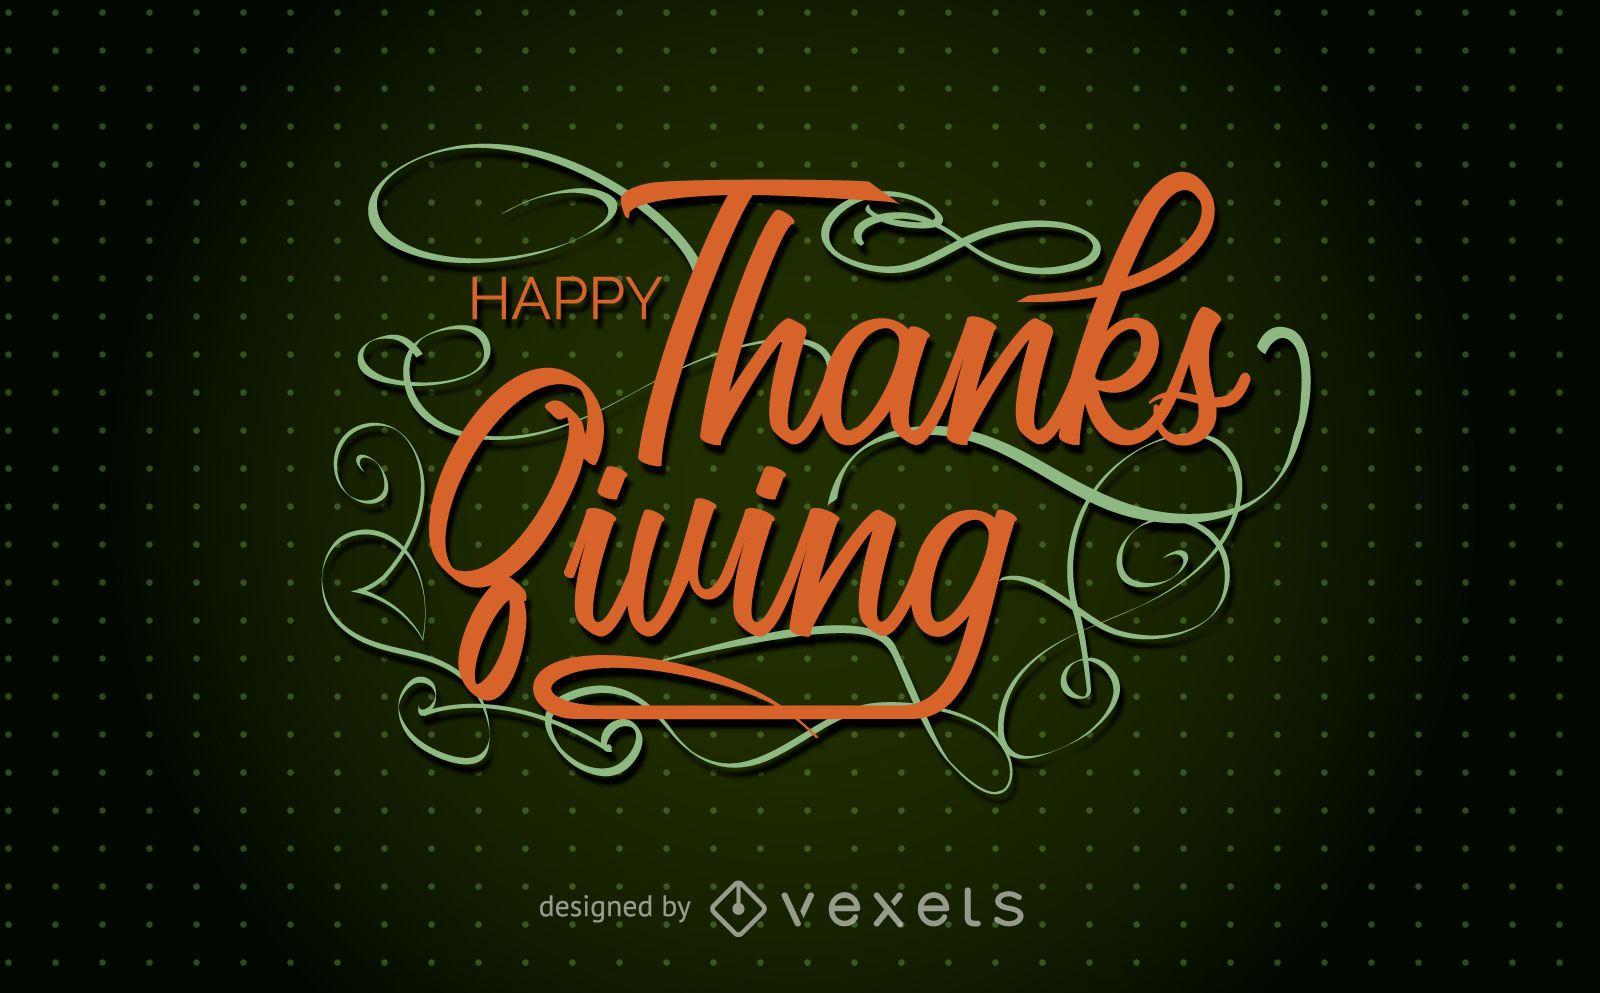 Festive Happy Thanksgiving card